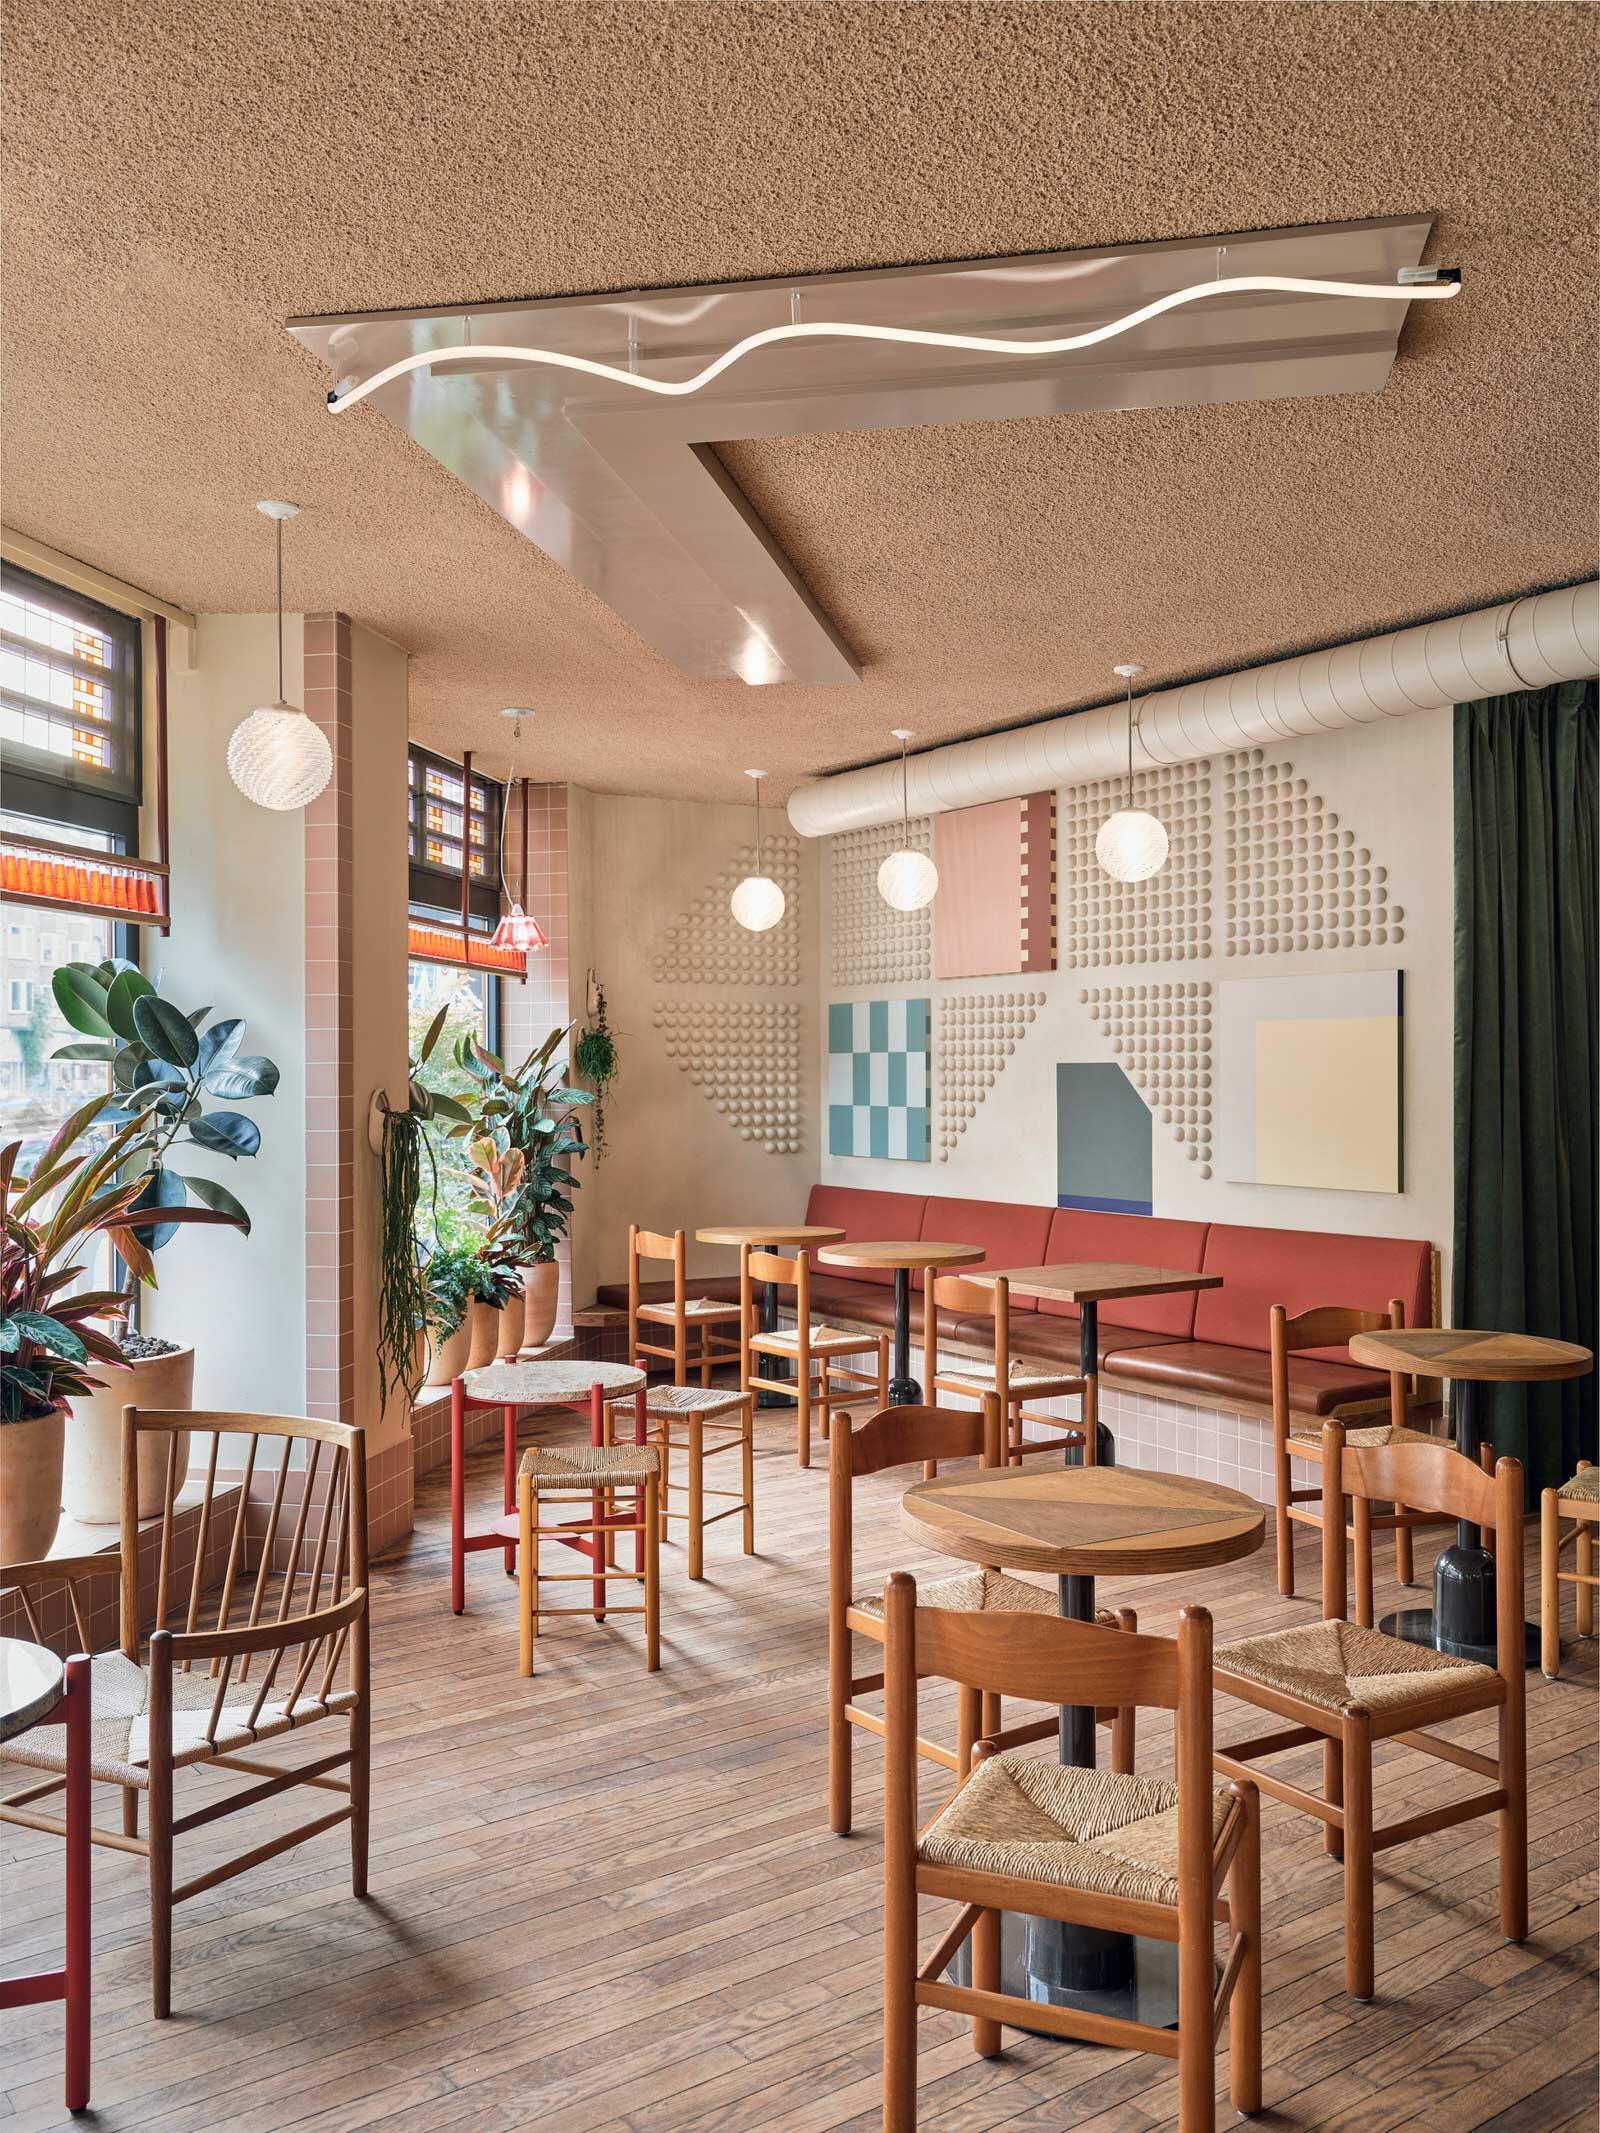 Studio Modijefsky Volare Bomboloni Amsterdam Hospitality Interiors Photo Maarten Willemstein Yellowtrace 03